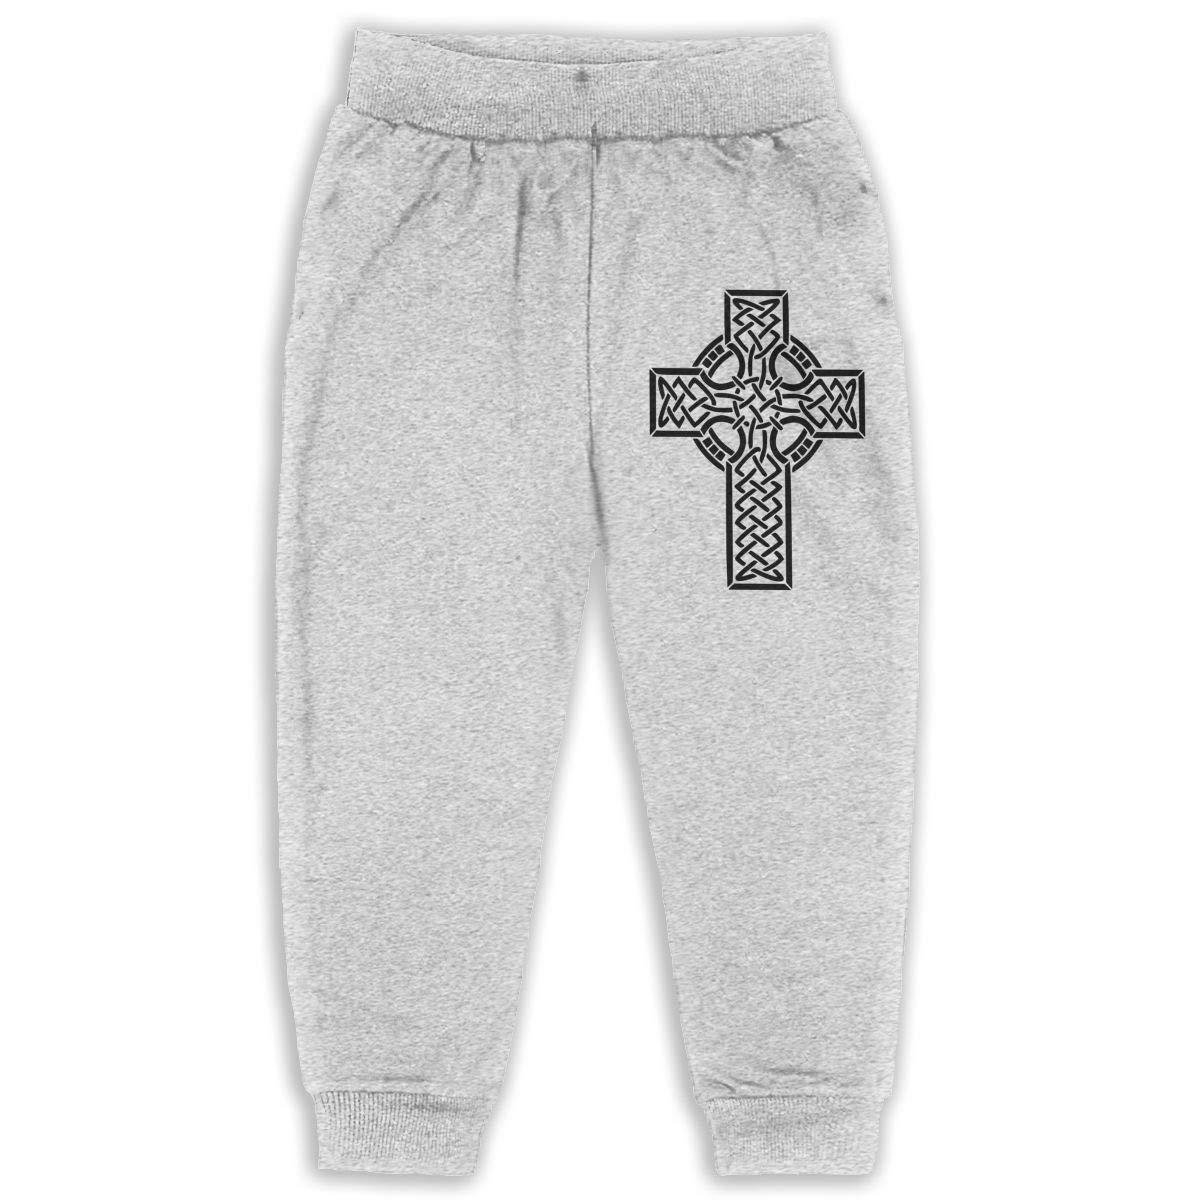 Fleece Active Joggers Elastic Pants Cross Sweatpants for Boys /& Girls